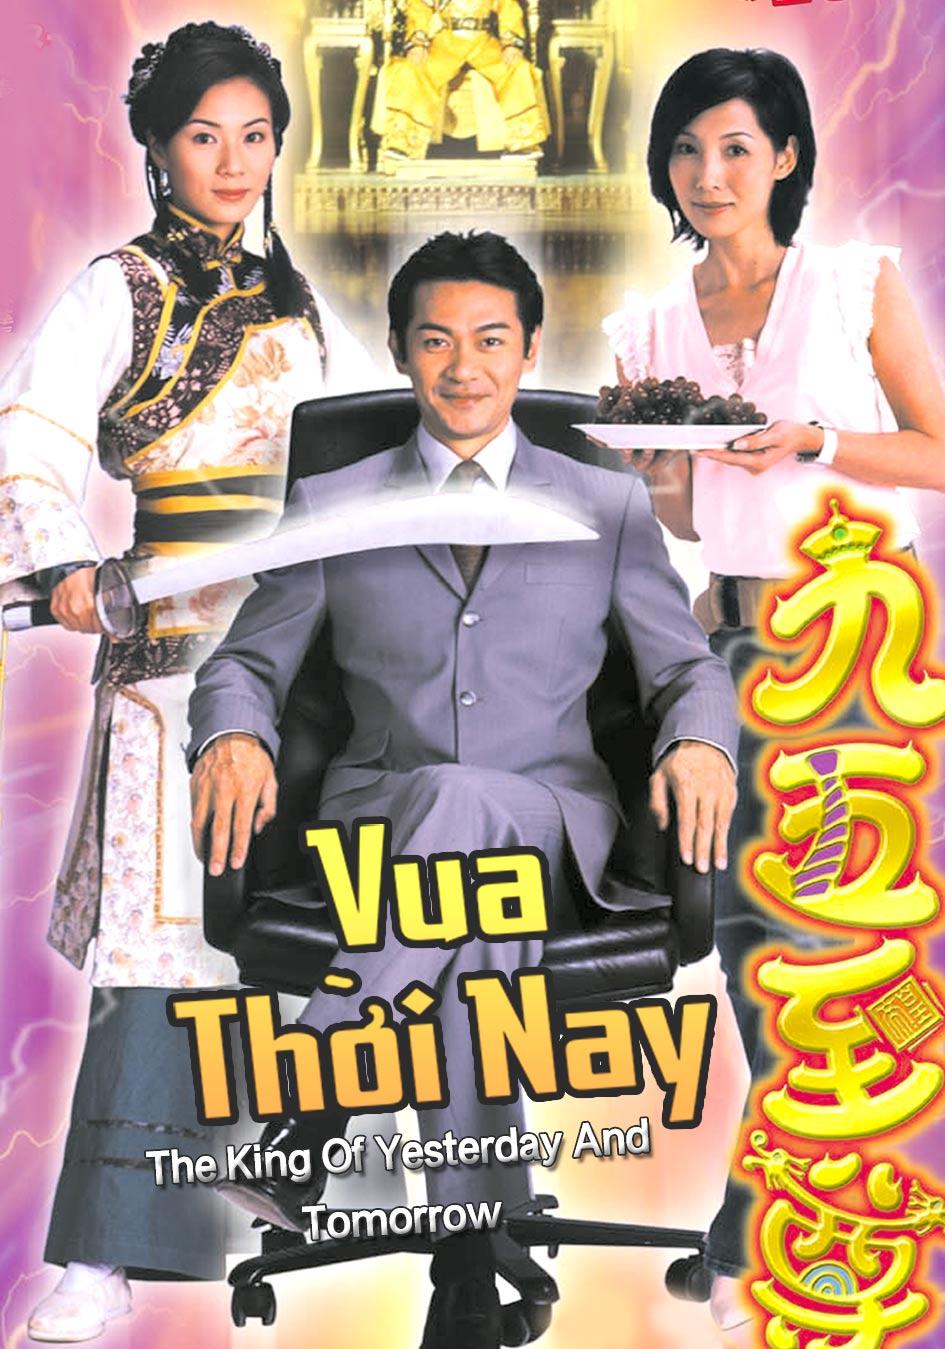 Vua Thời Nay-